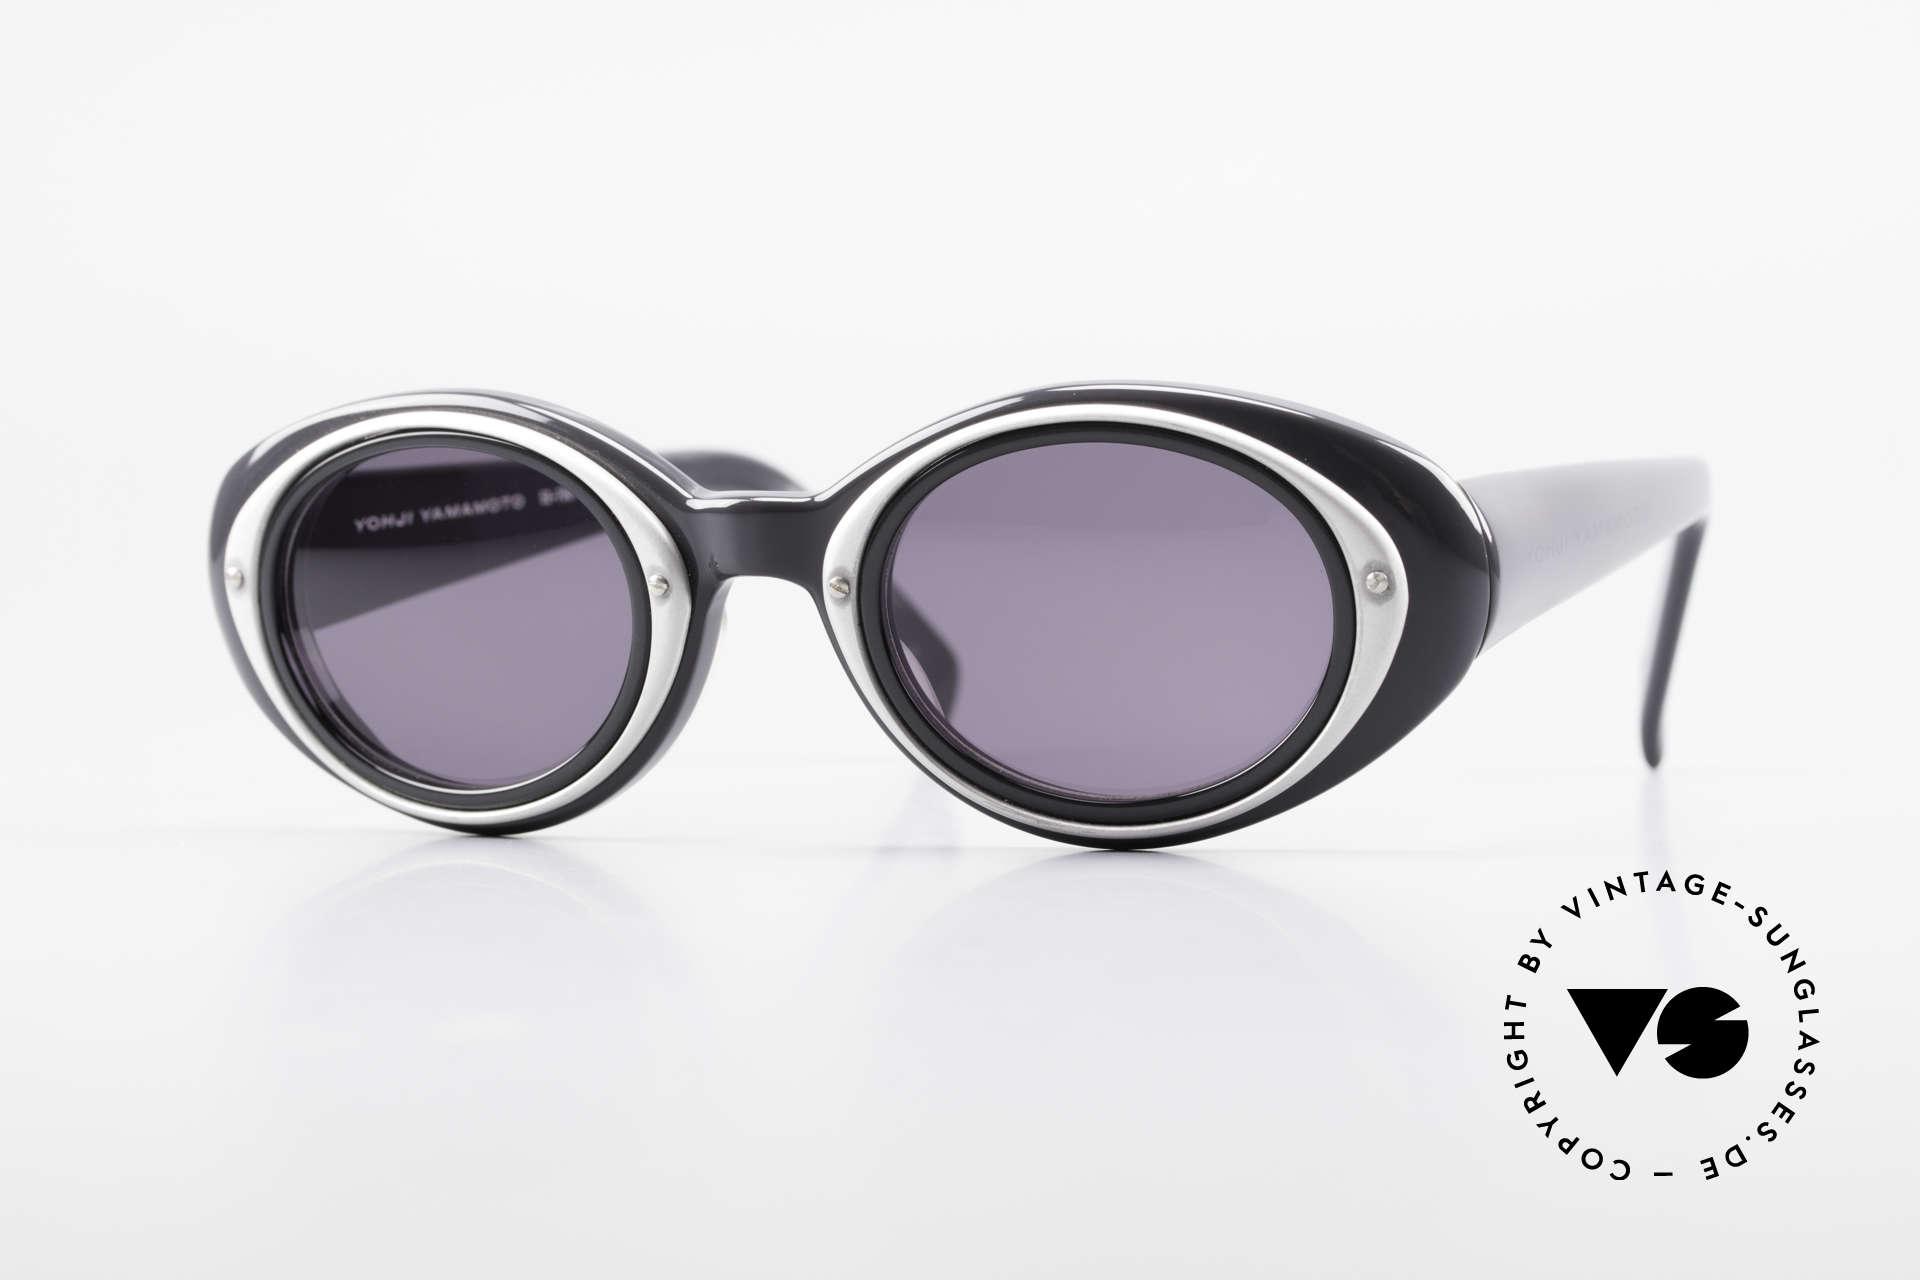 Yohji Yamamoto 52-7001 Sunglasses Kurt Cobrain Style, distinguished vintage Y. Yamamoto shades of the 90s, Made for Men and Women